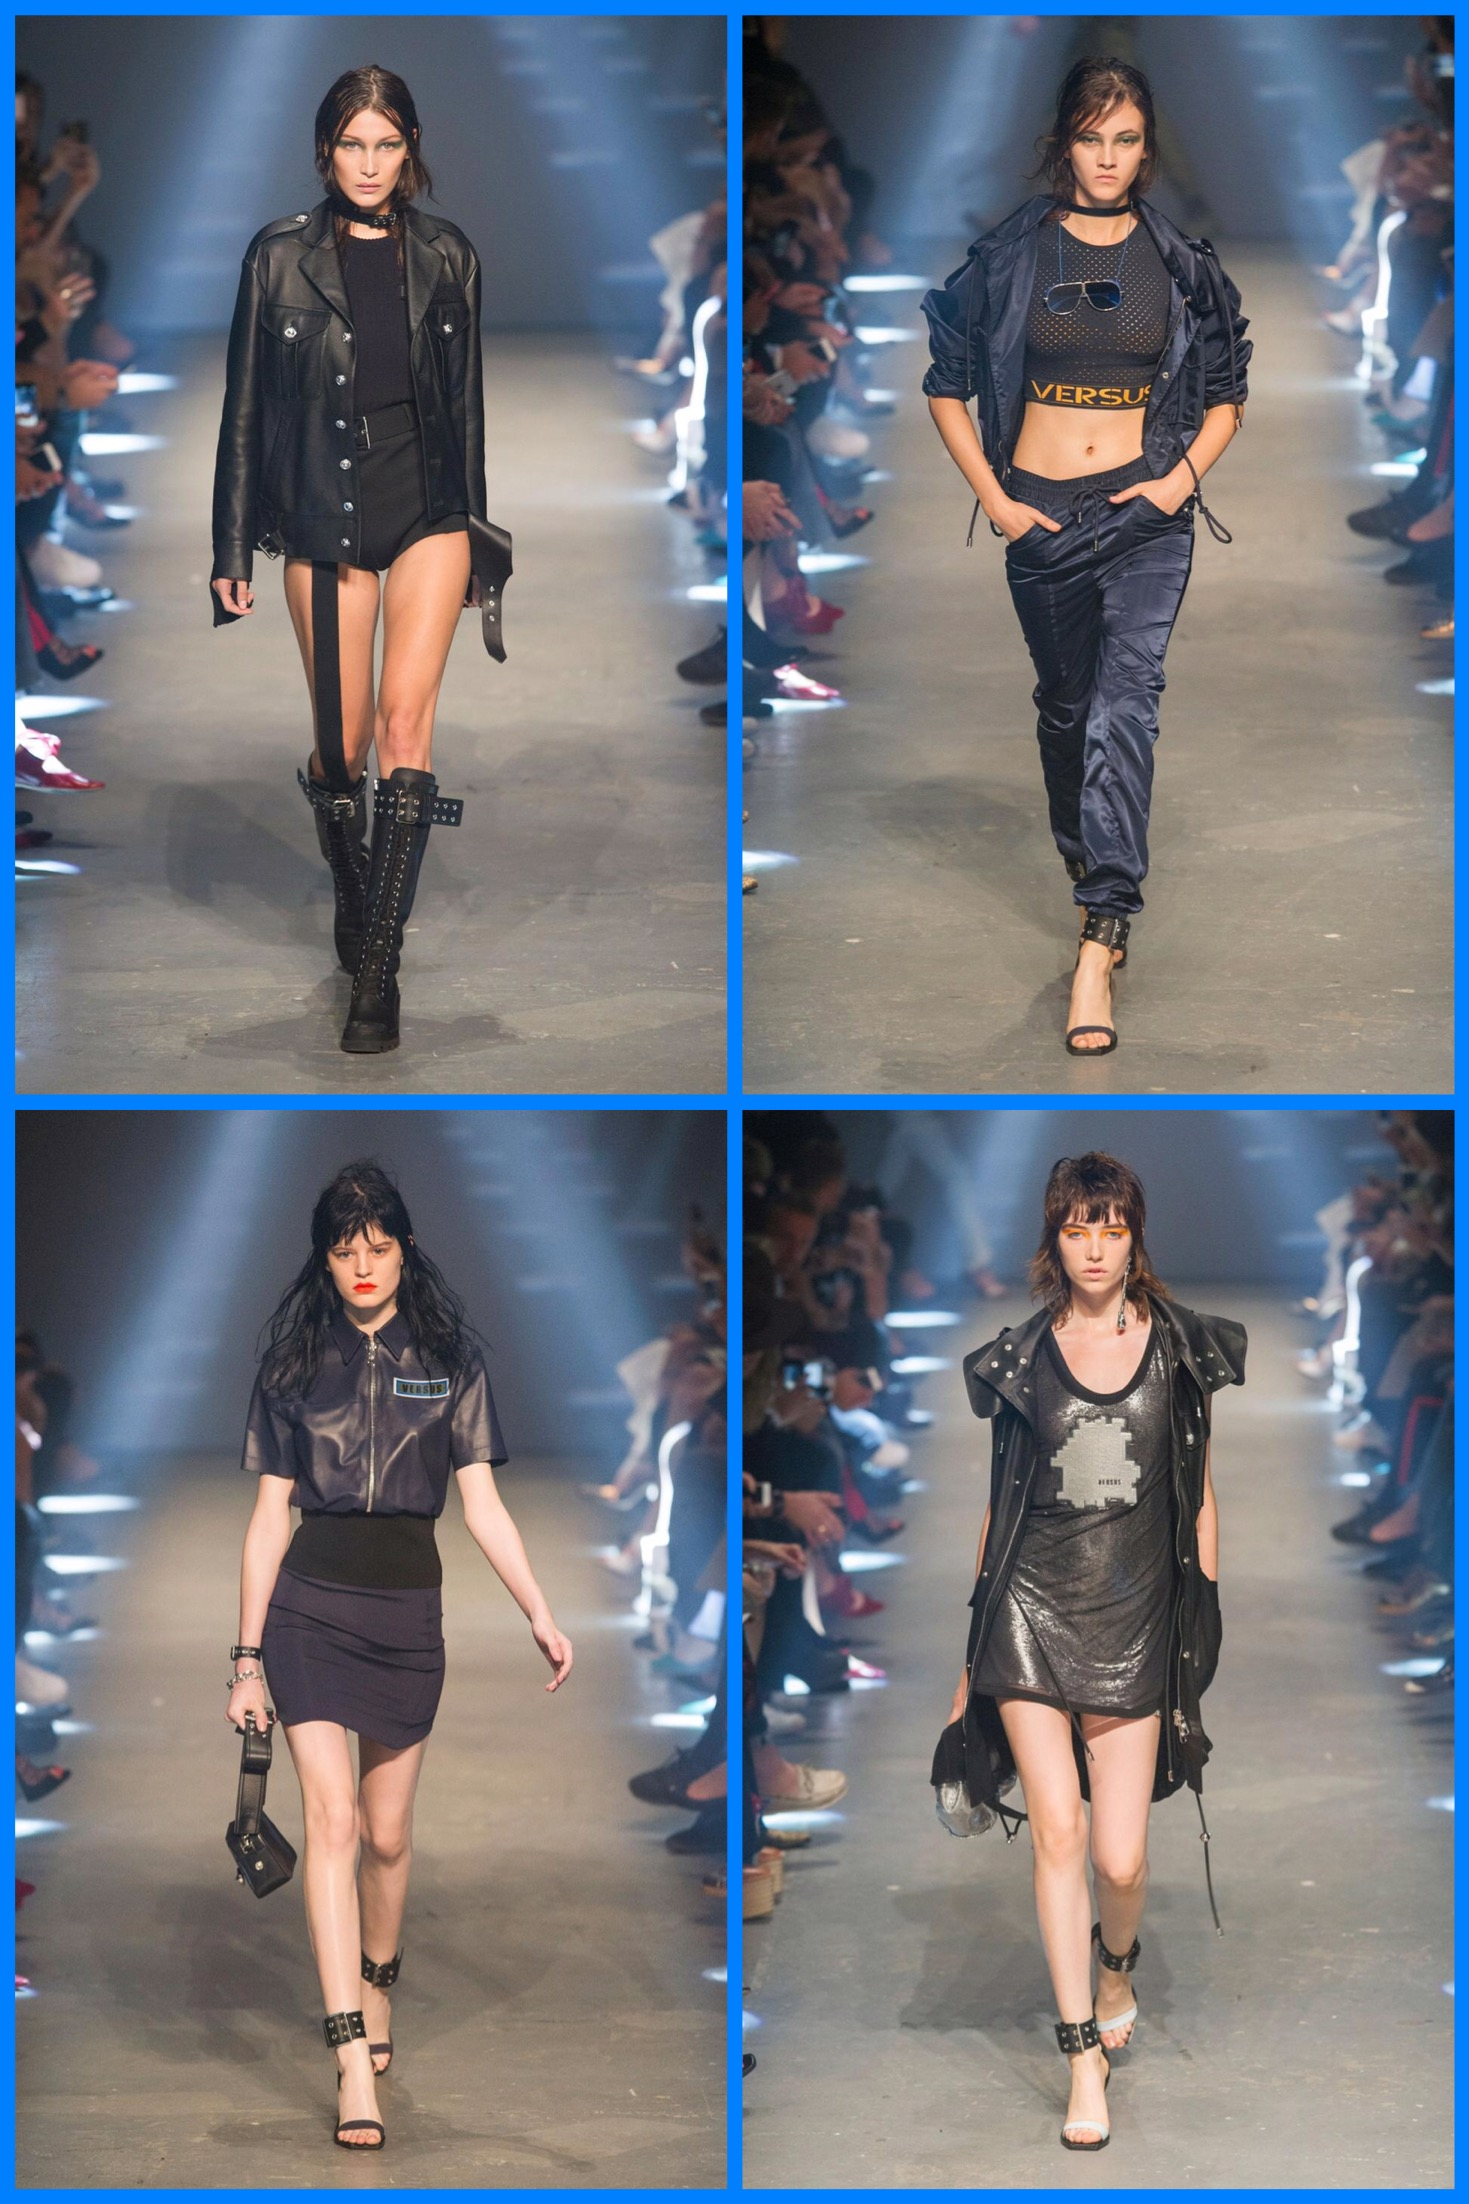 london-fashion-week-pret-a-porter-spring-summer-2017-style-versus